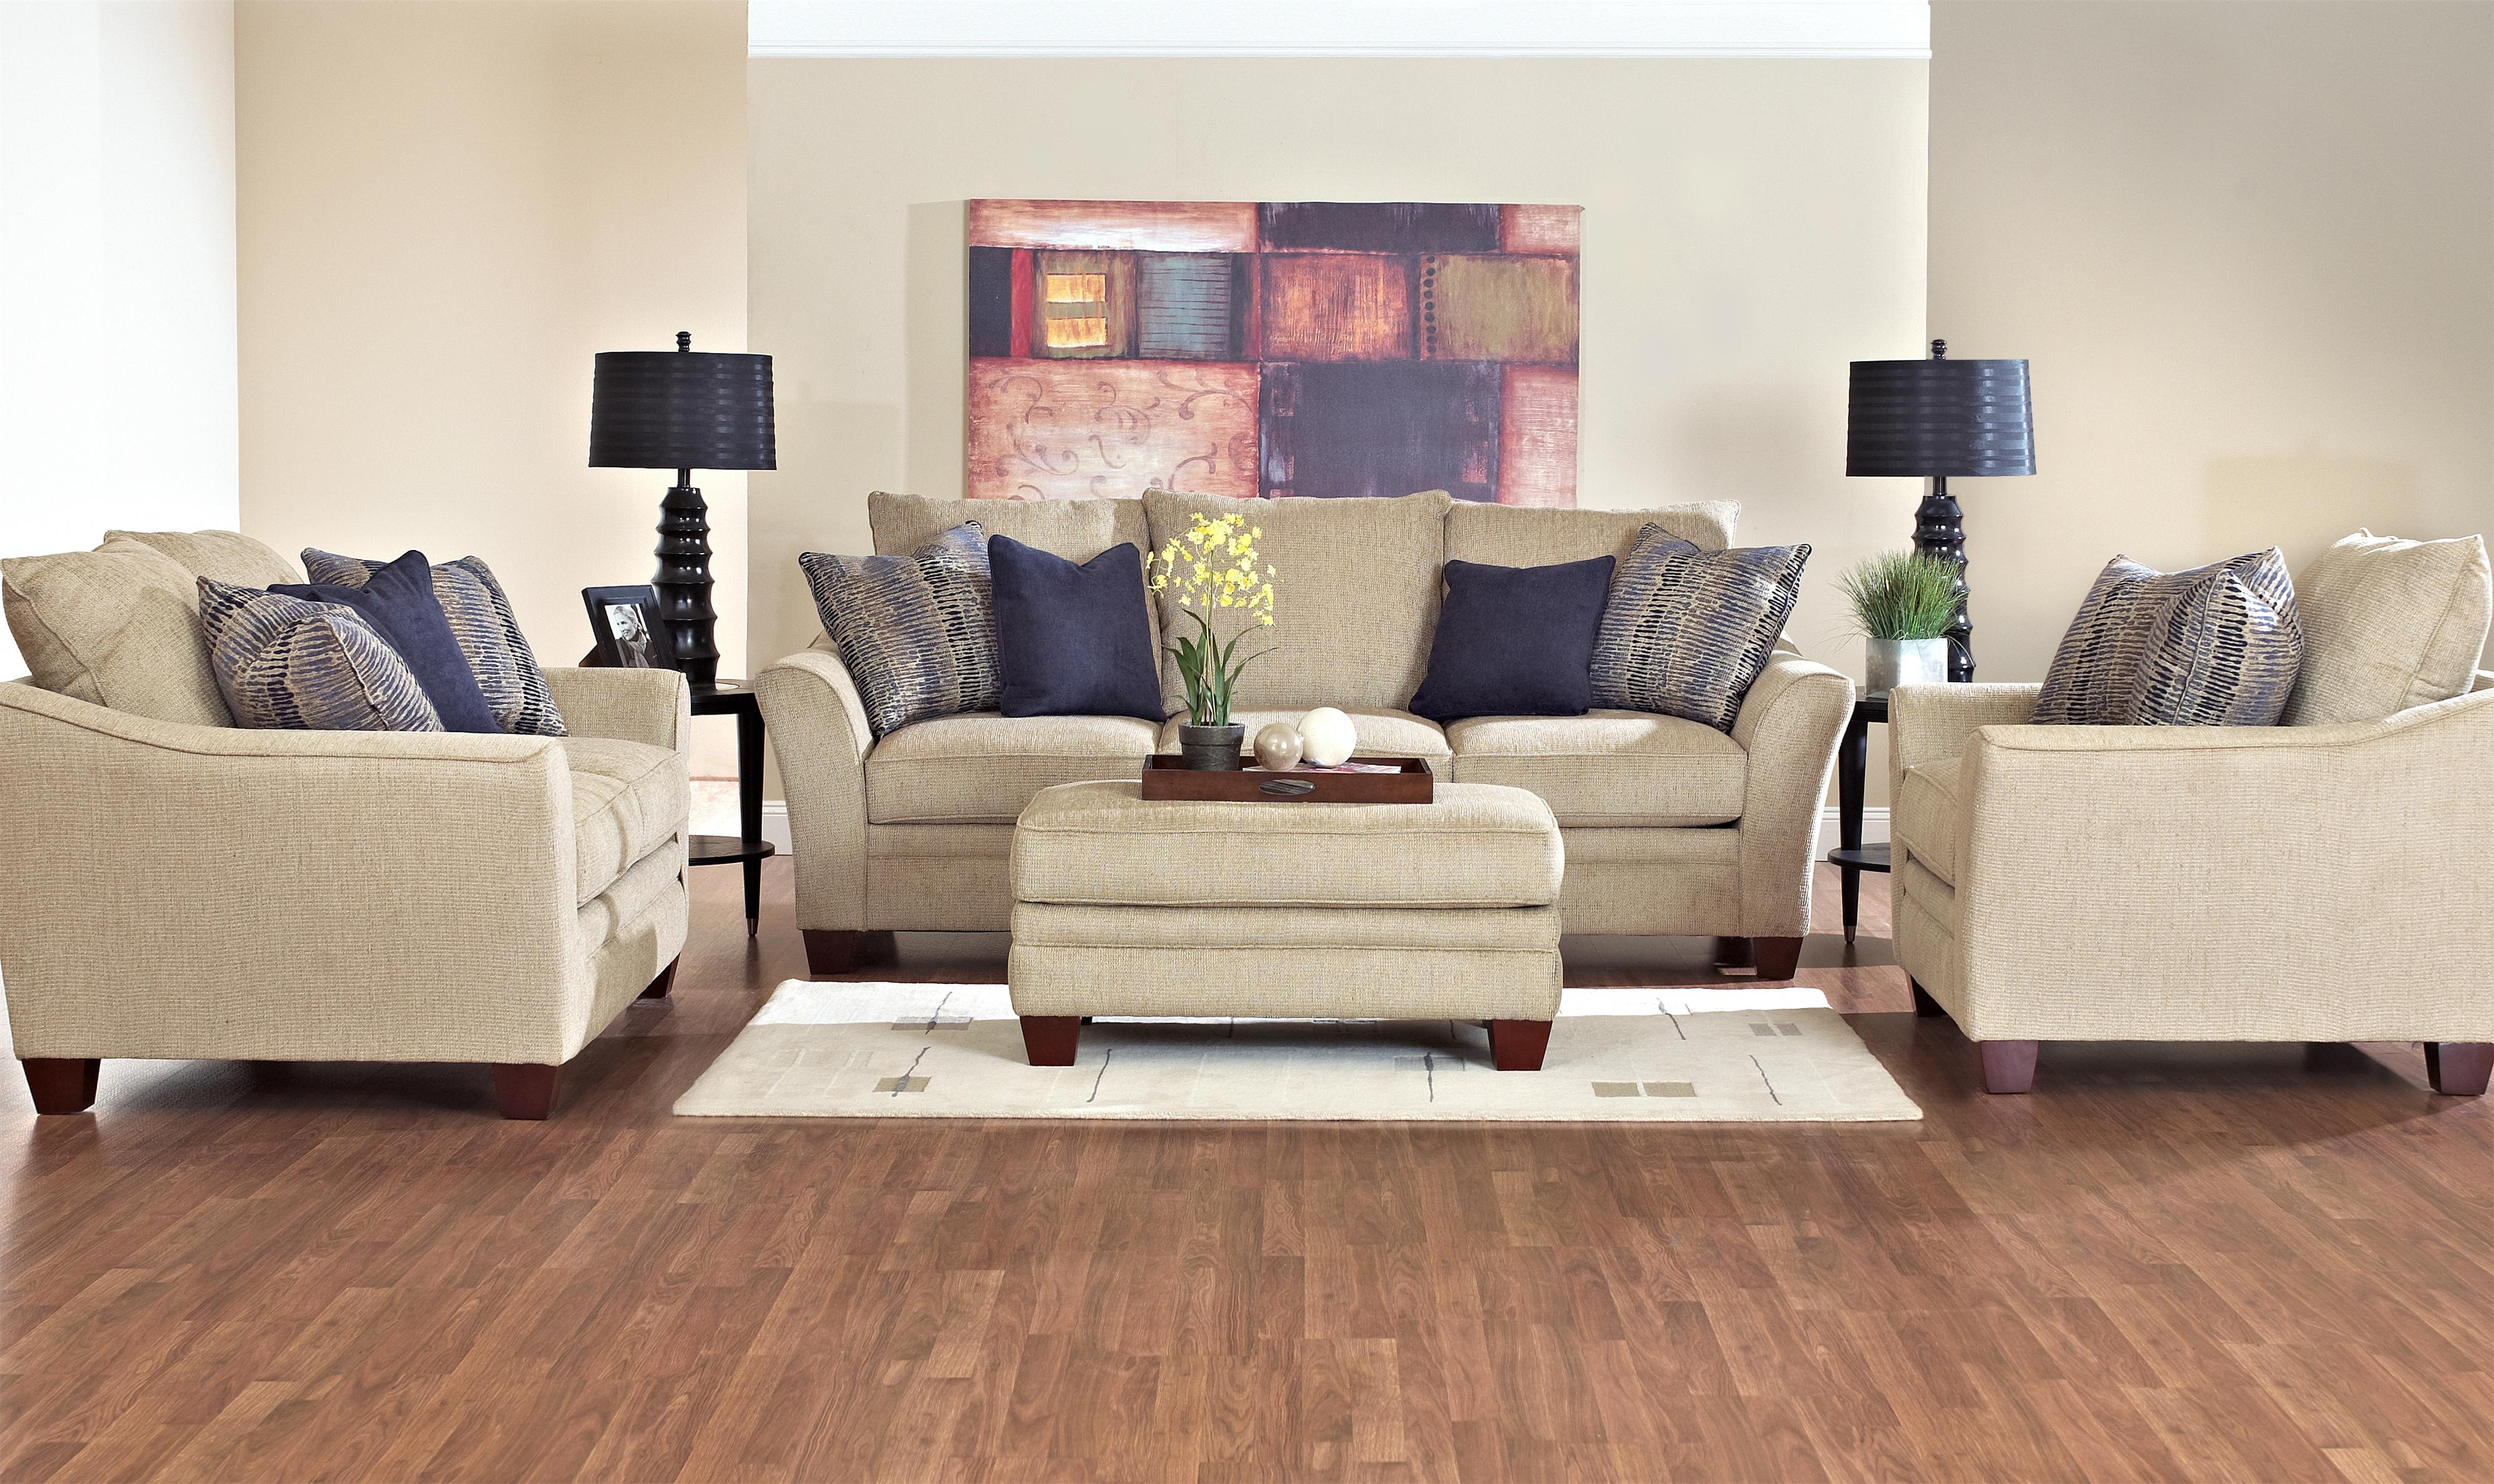 Klaussner Posen Stationary Living Room Group Olinde 39 S